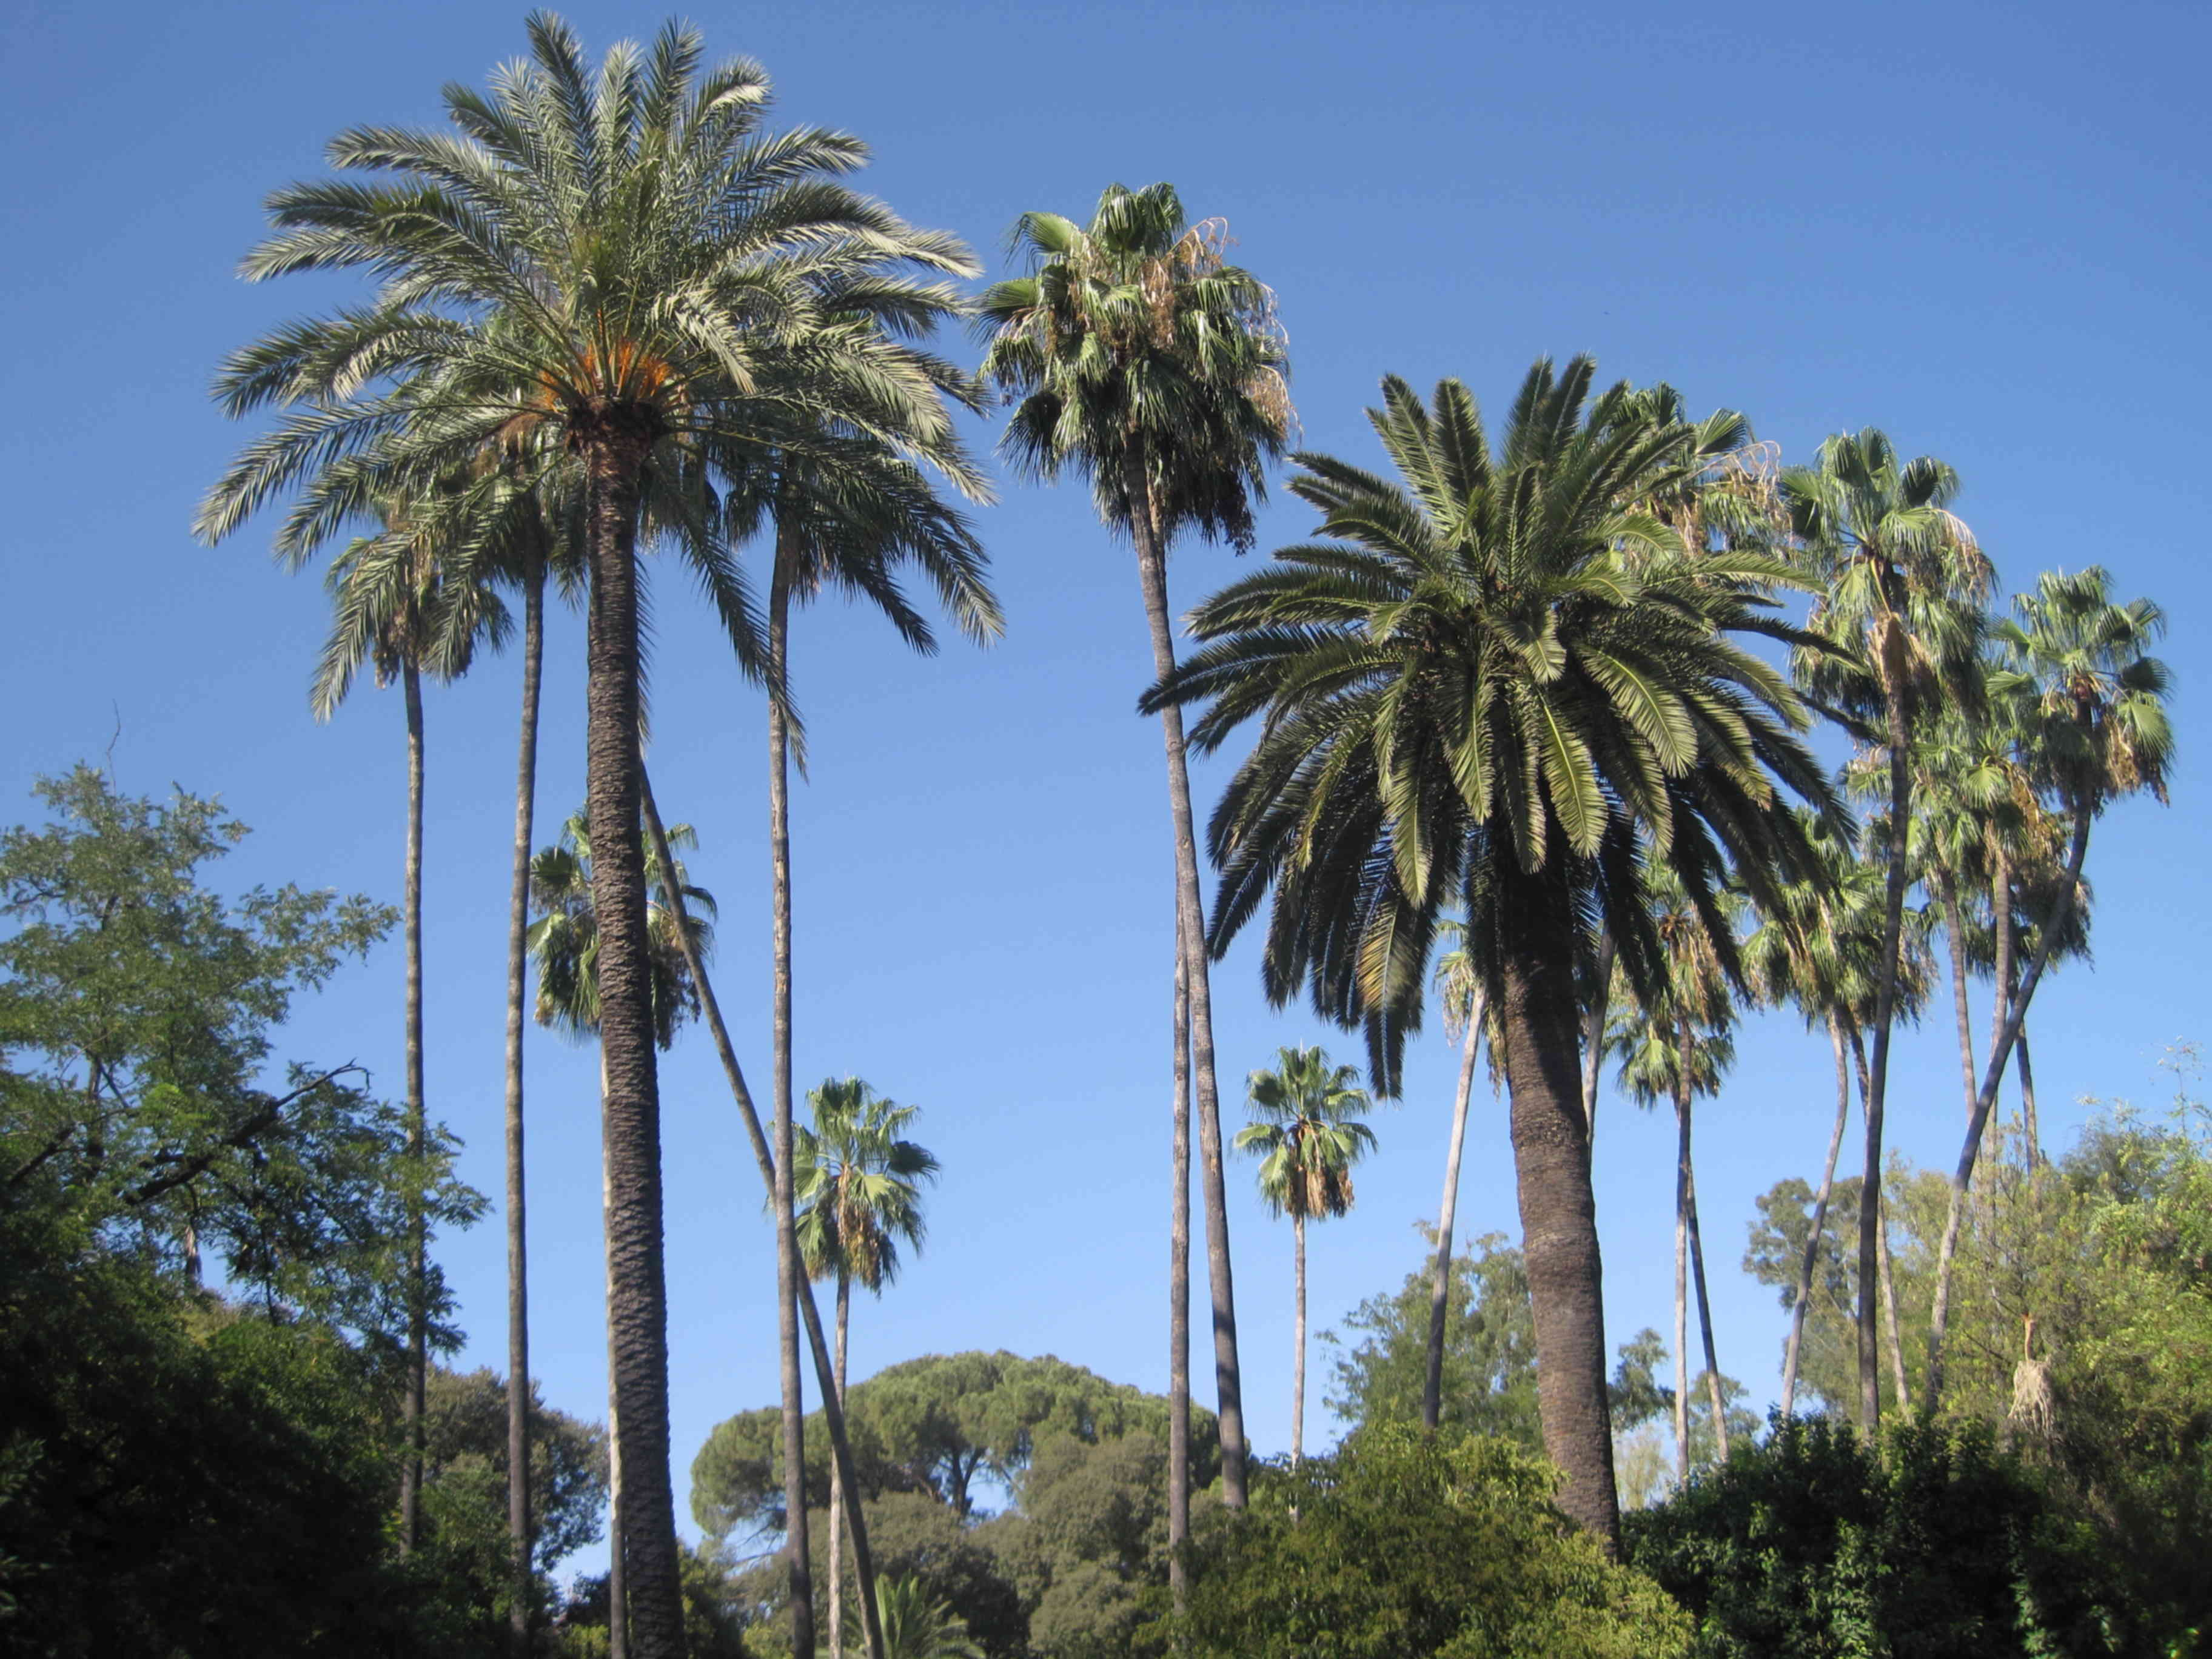 Piante Palme : Palme cycas cocos come curare le piante esotiche